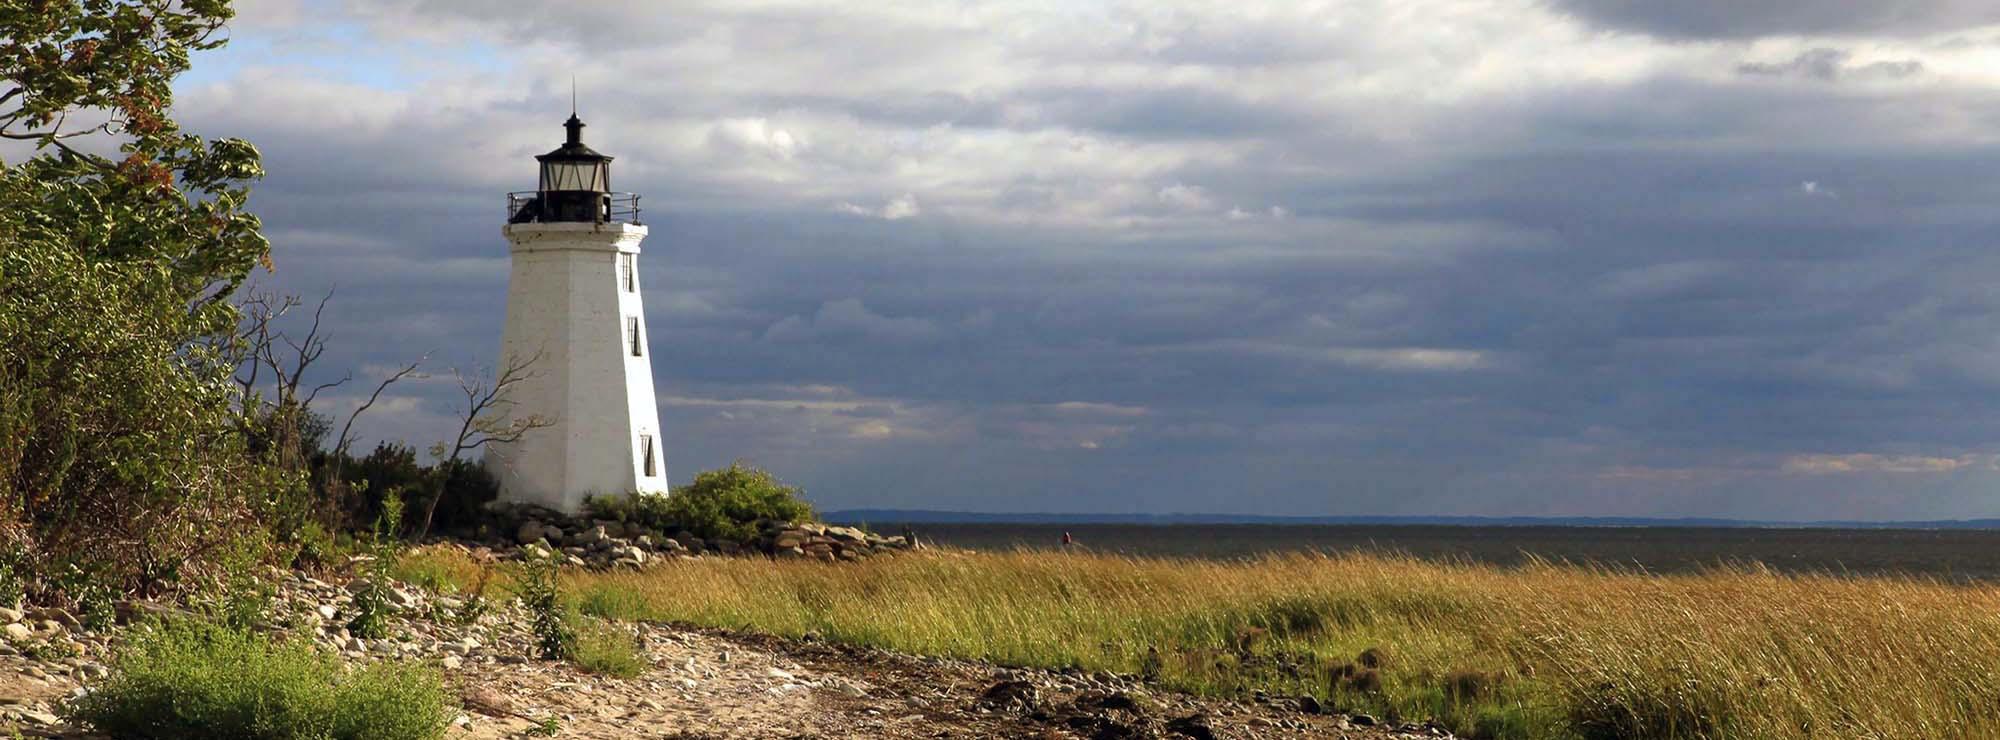 Fayerweather Island (Black Rock Harbor) Bridgeport Connecticut